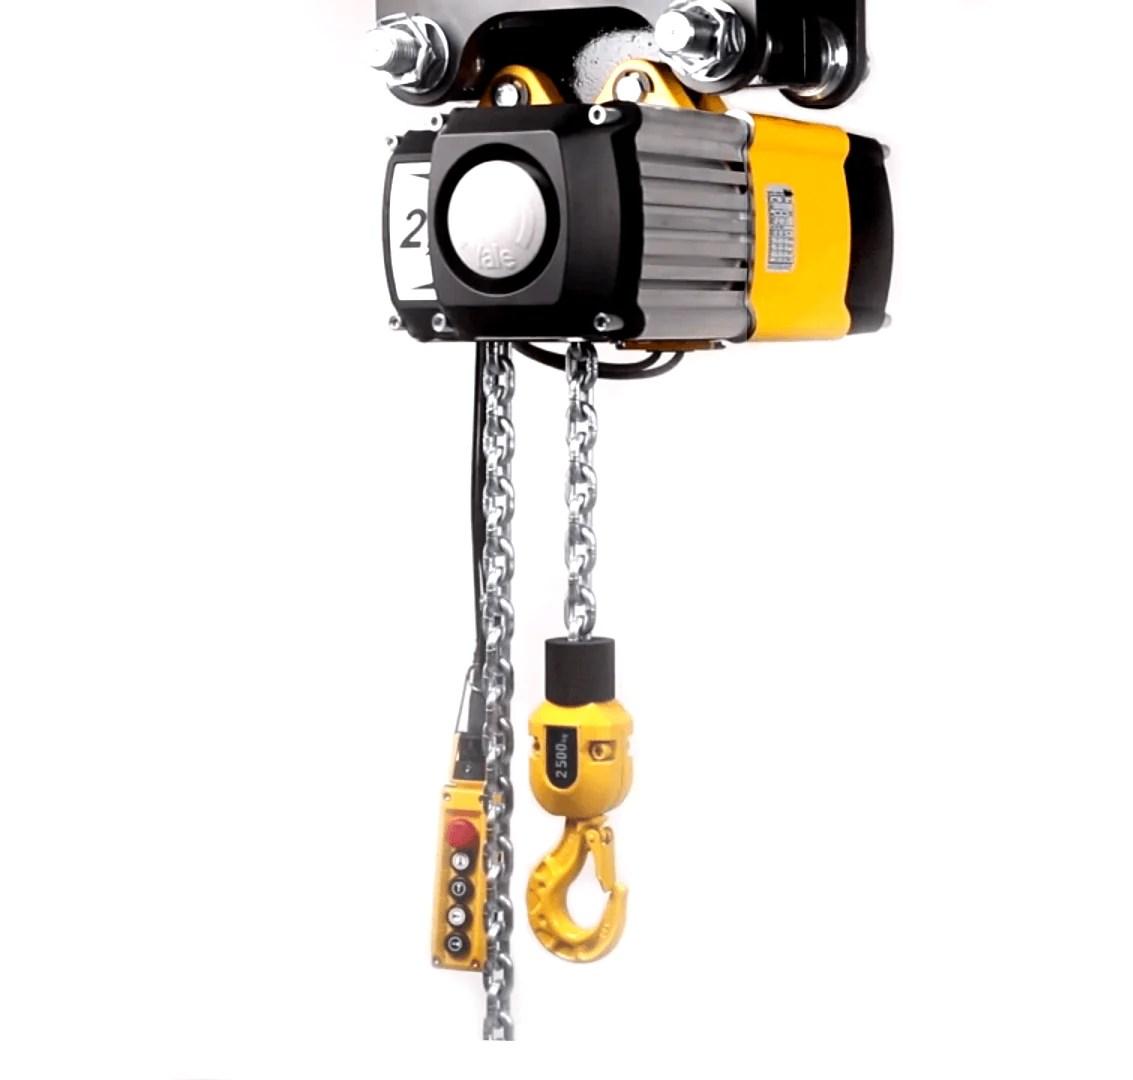 hight resolution of  yale electric chain hoist 2 ton 4m min cpv cpvf